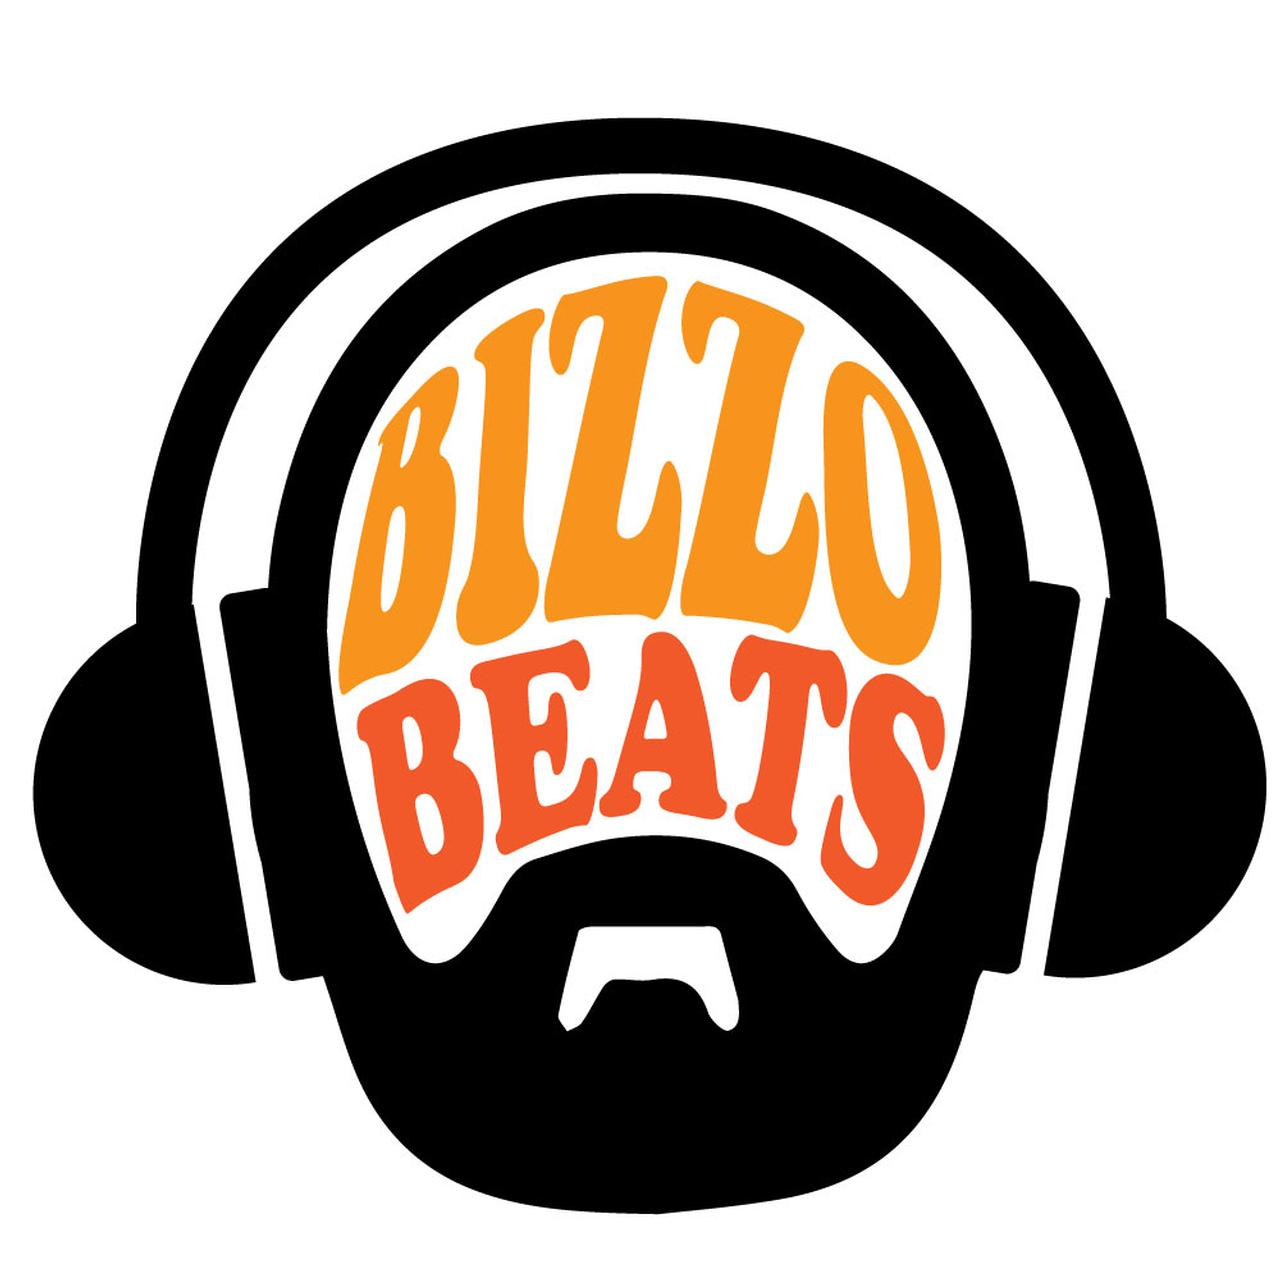 1280x1280 Soundclick Artist Bizzo Beats